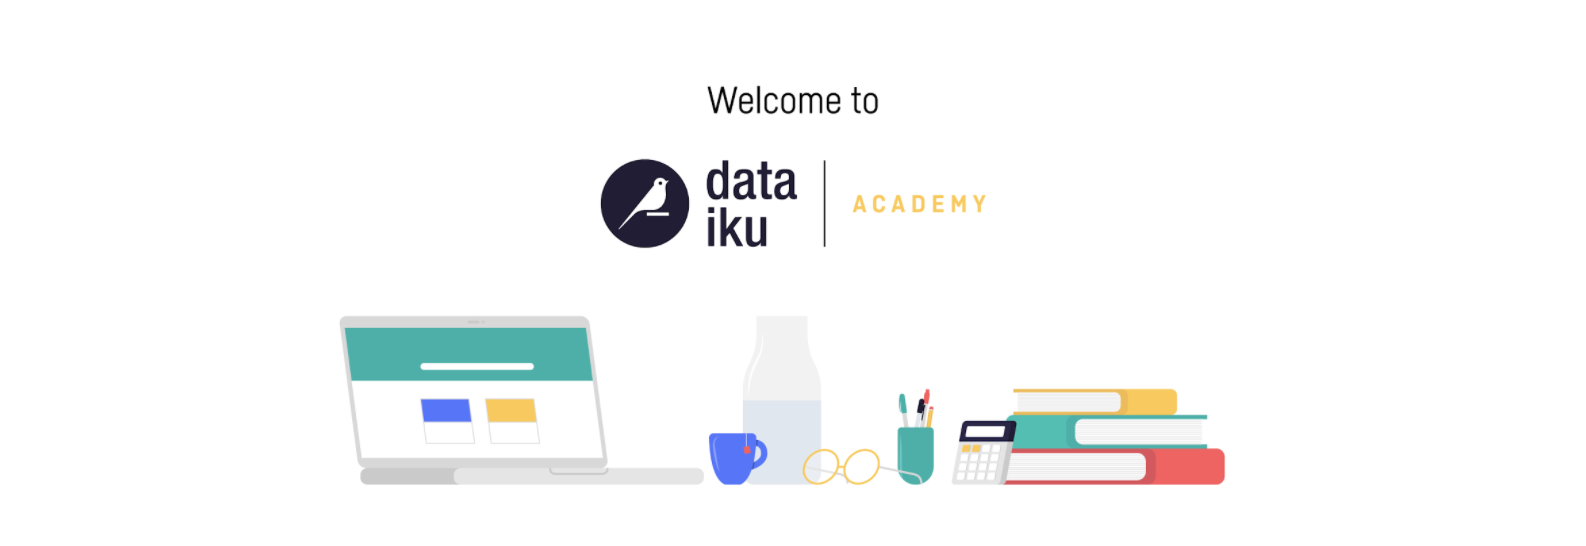 welcome-to-dataiku-academy